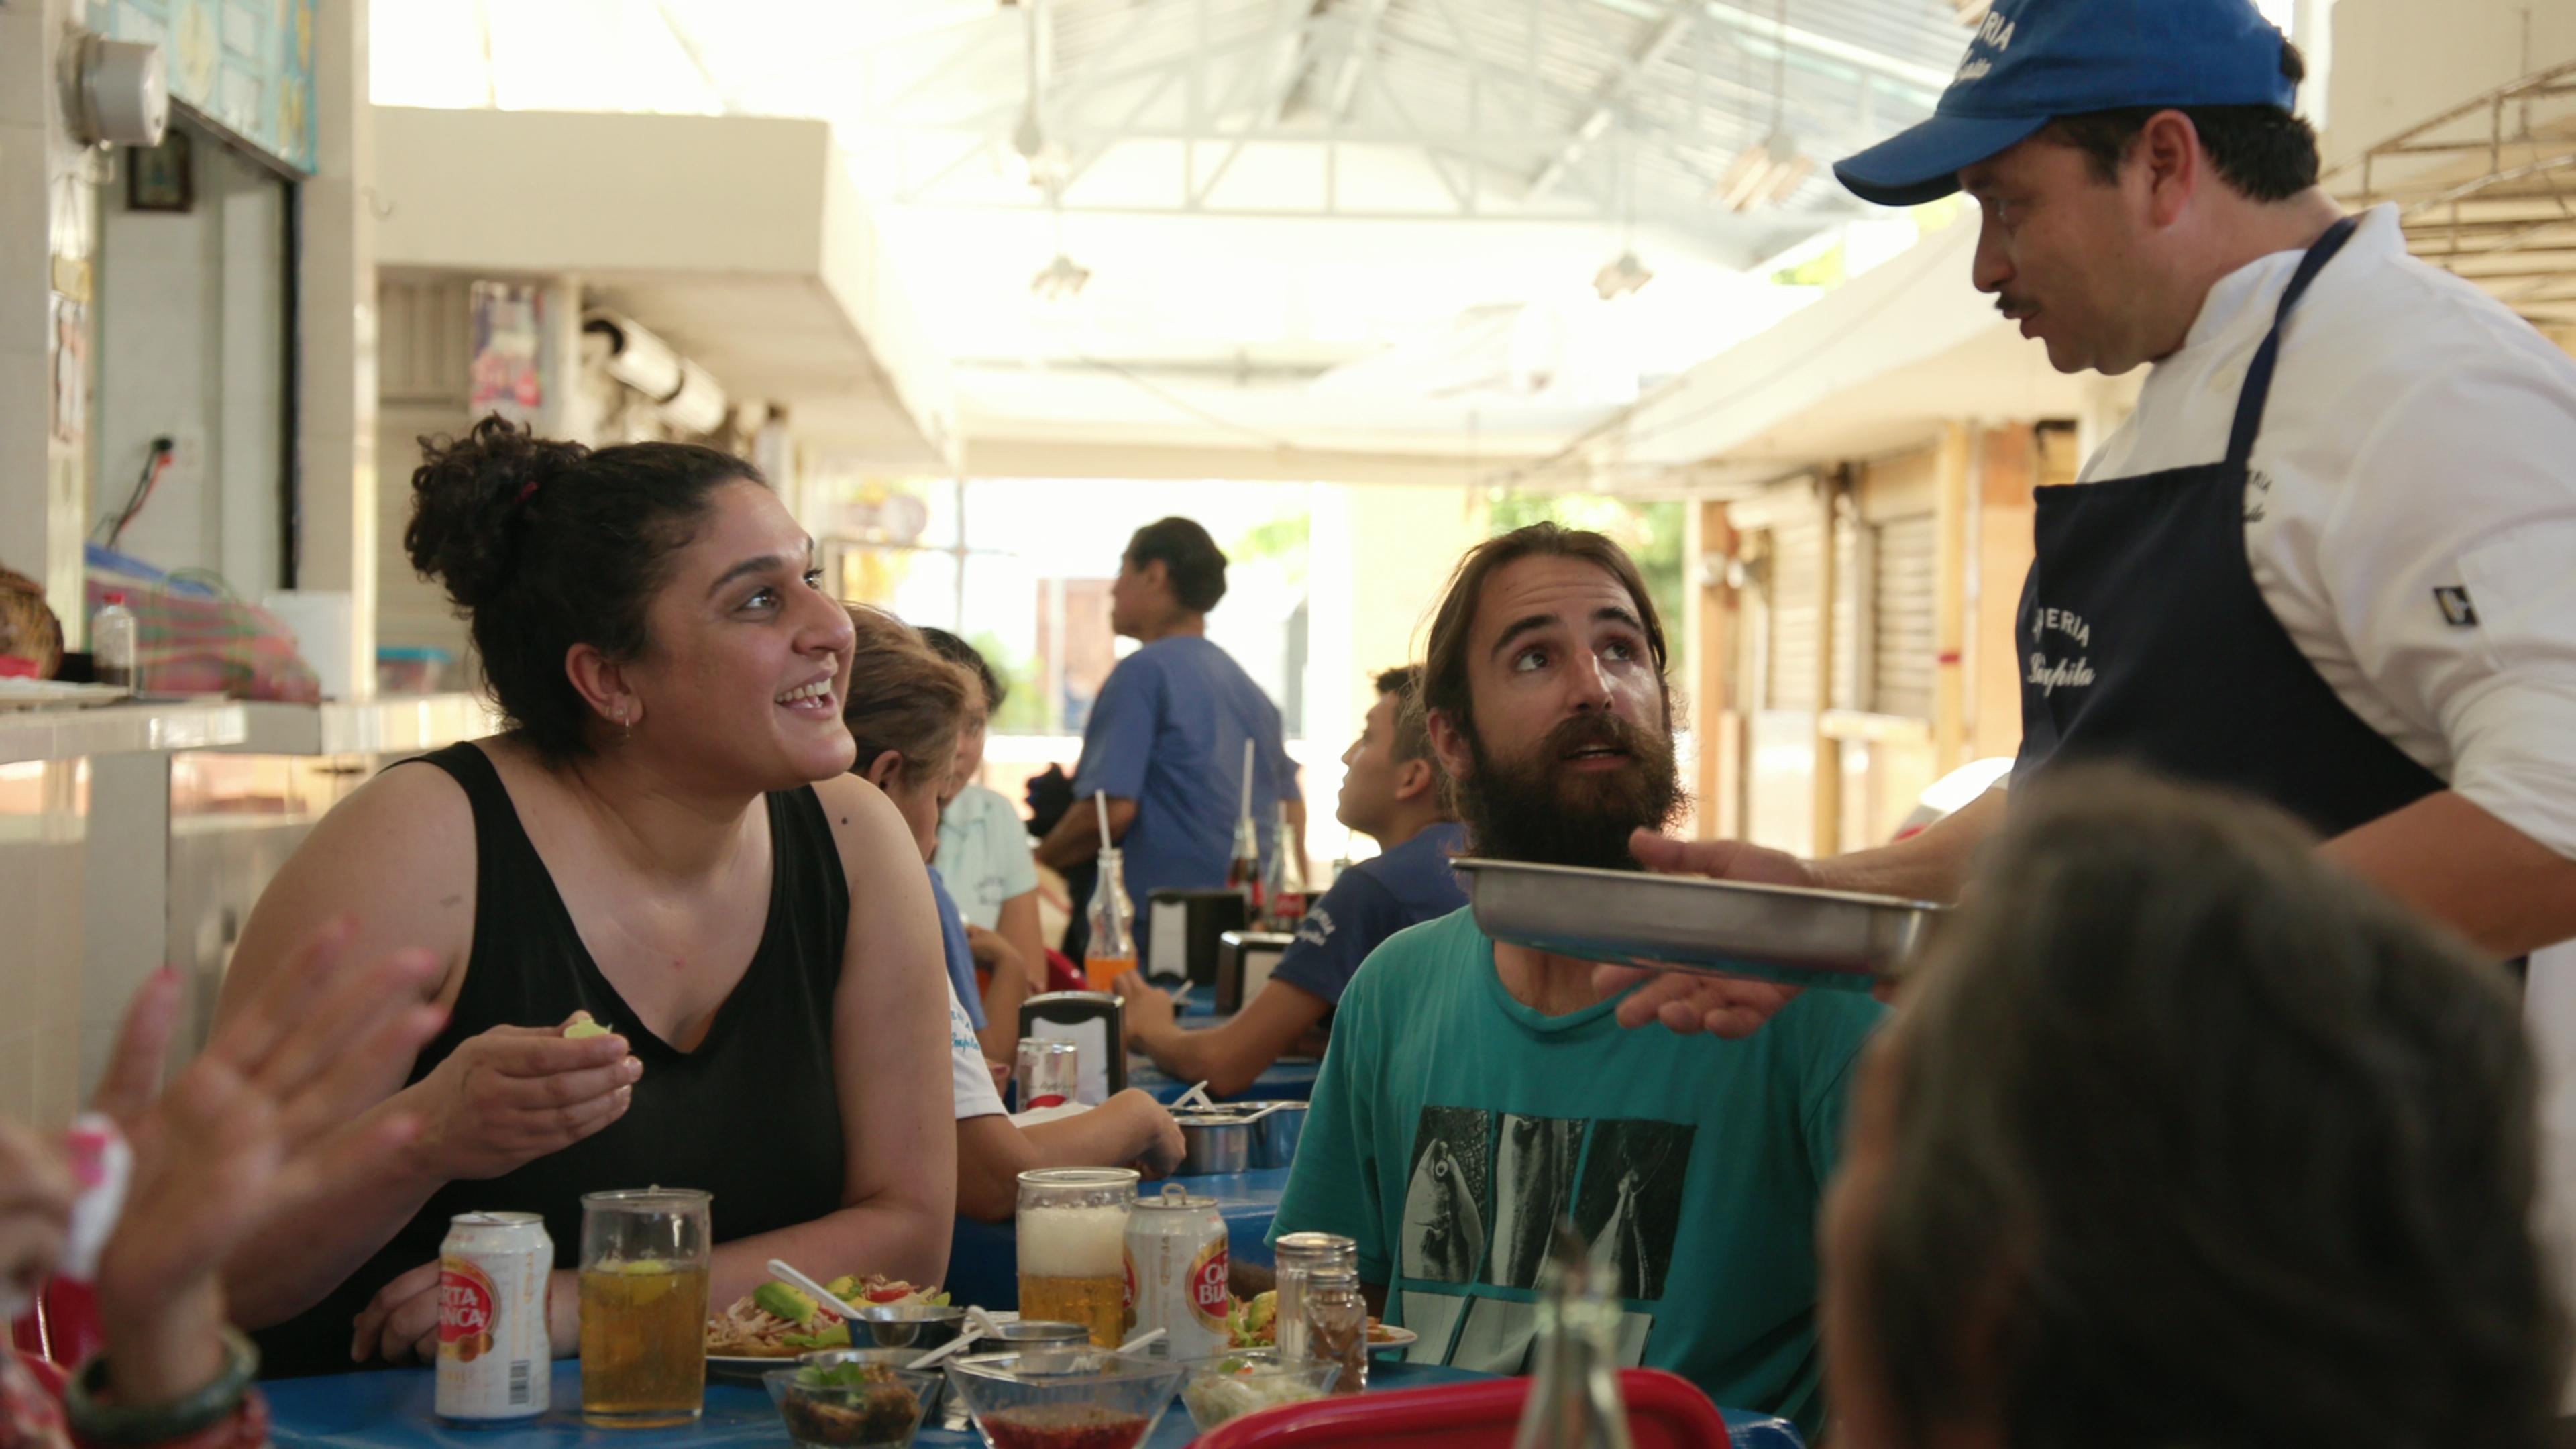 'Salt, Fat, Acid, Heat' Recap: Samin Heads to Mexico for a Study in Citrus